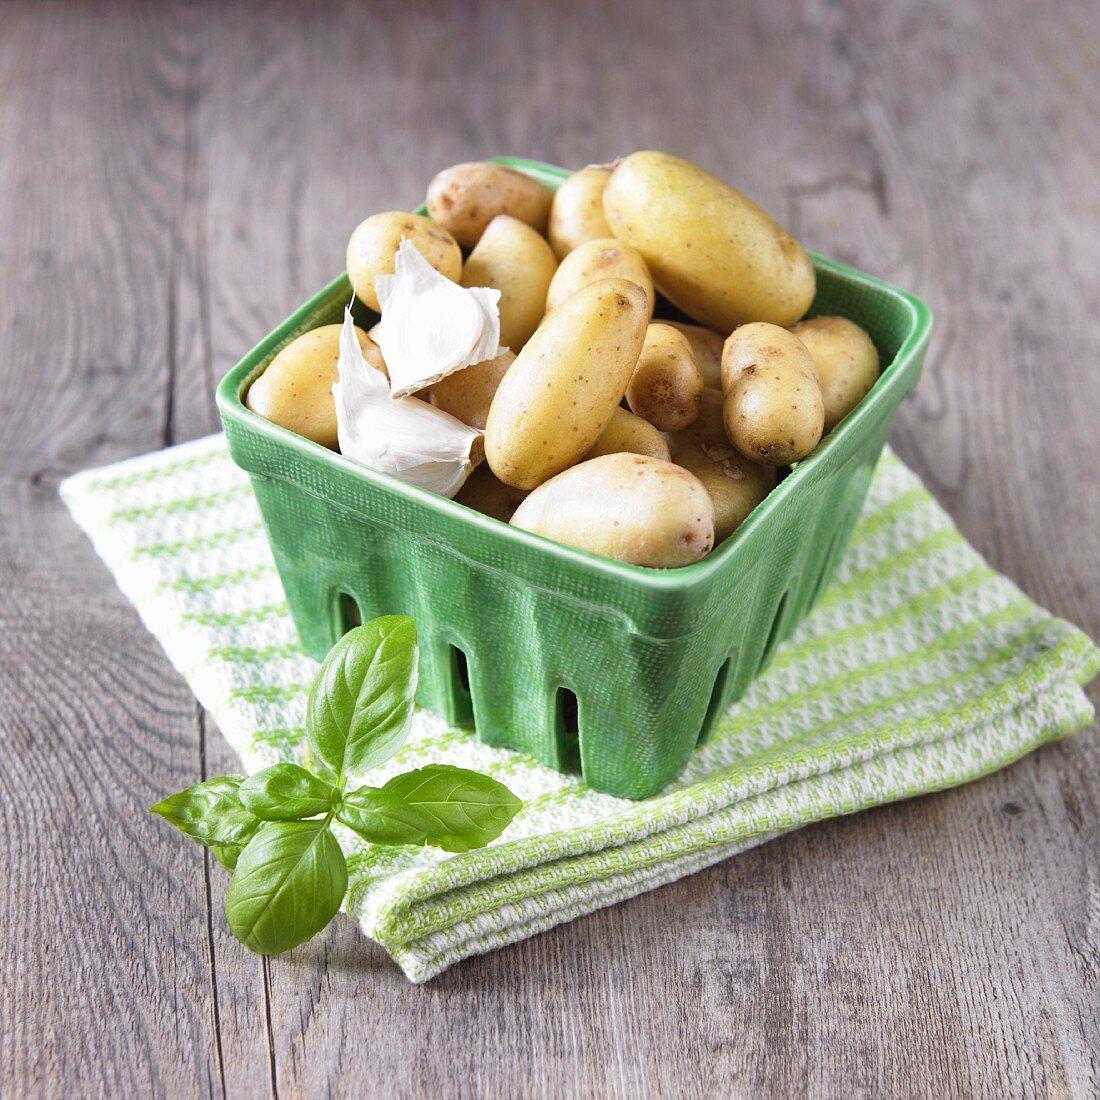 Carton of Organic Baby Yukon Potatoes with Basil and Garlic